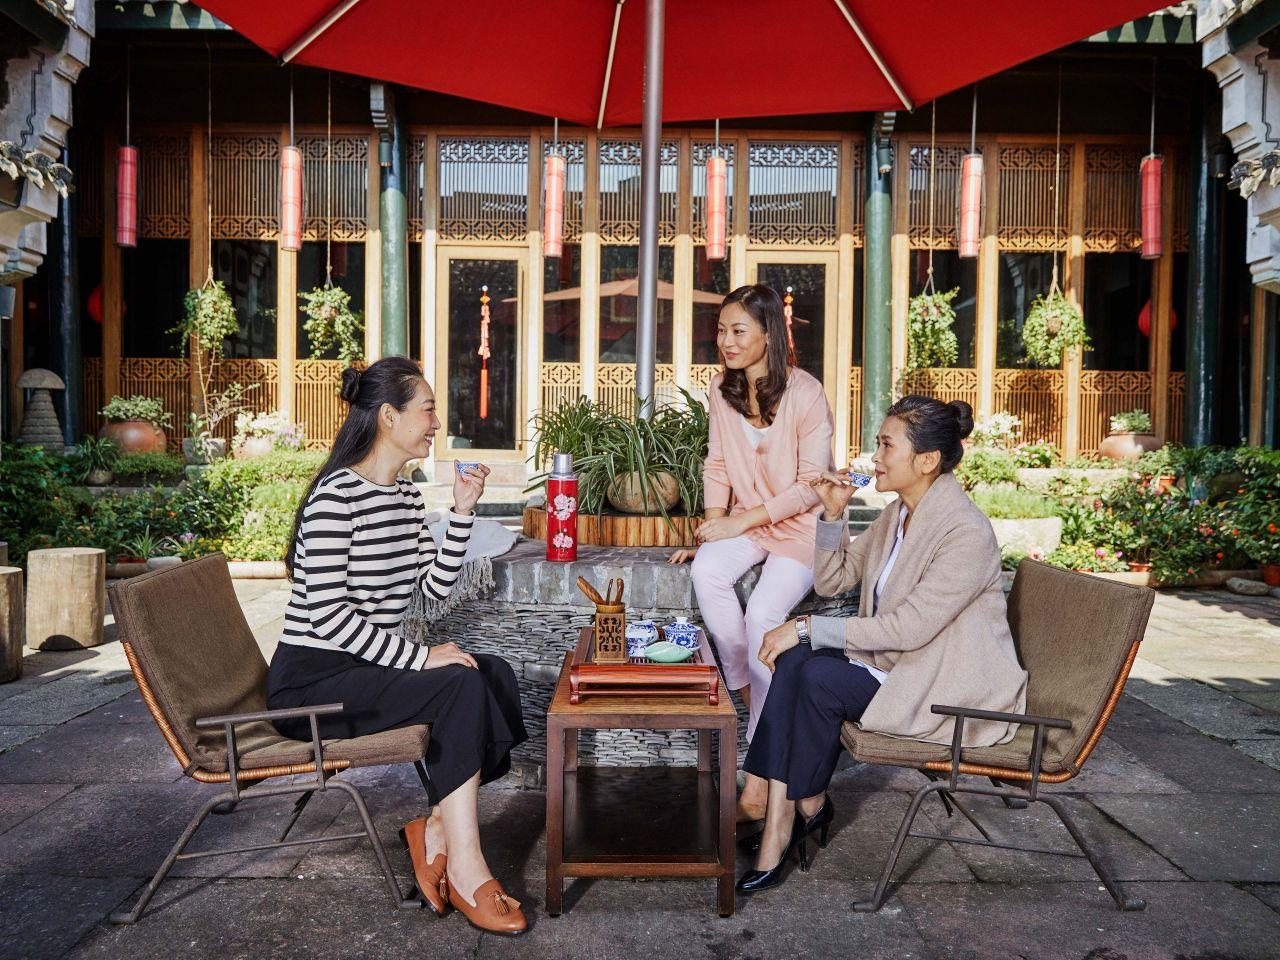 restaurants in siesta key hyatt residence club sarasota. Black Bedroom Furniture Sets. Home Design Ideas